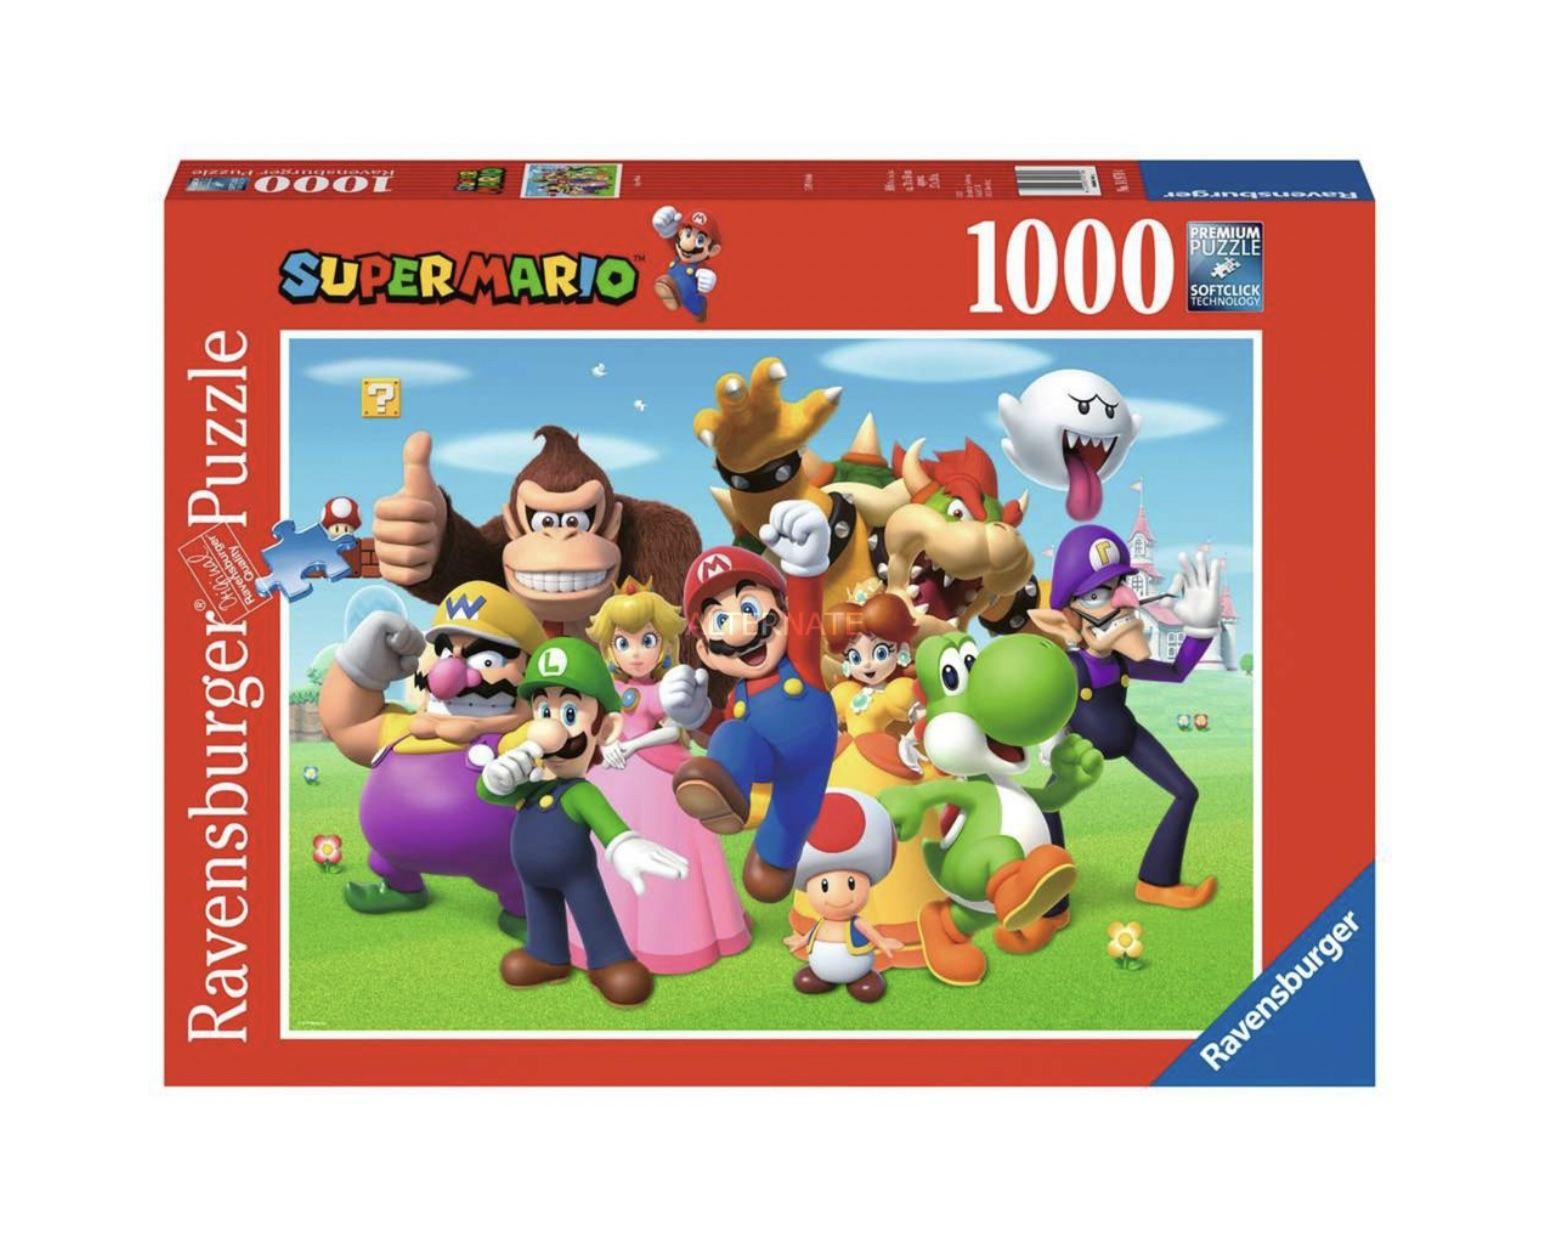 Ravensburger Puzzle 14970 – Super Mario für 8,99€ (statt 14€)